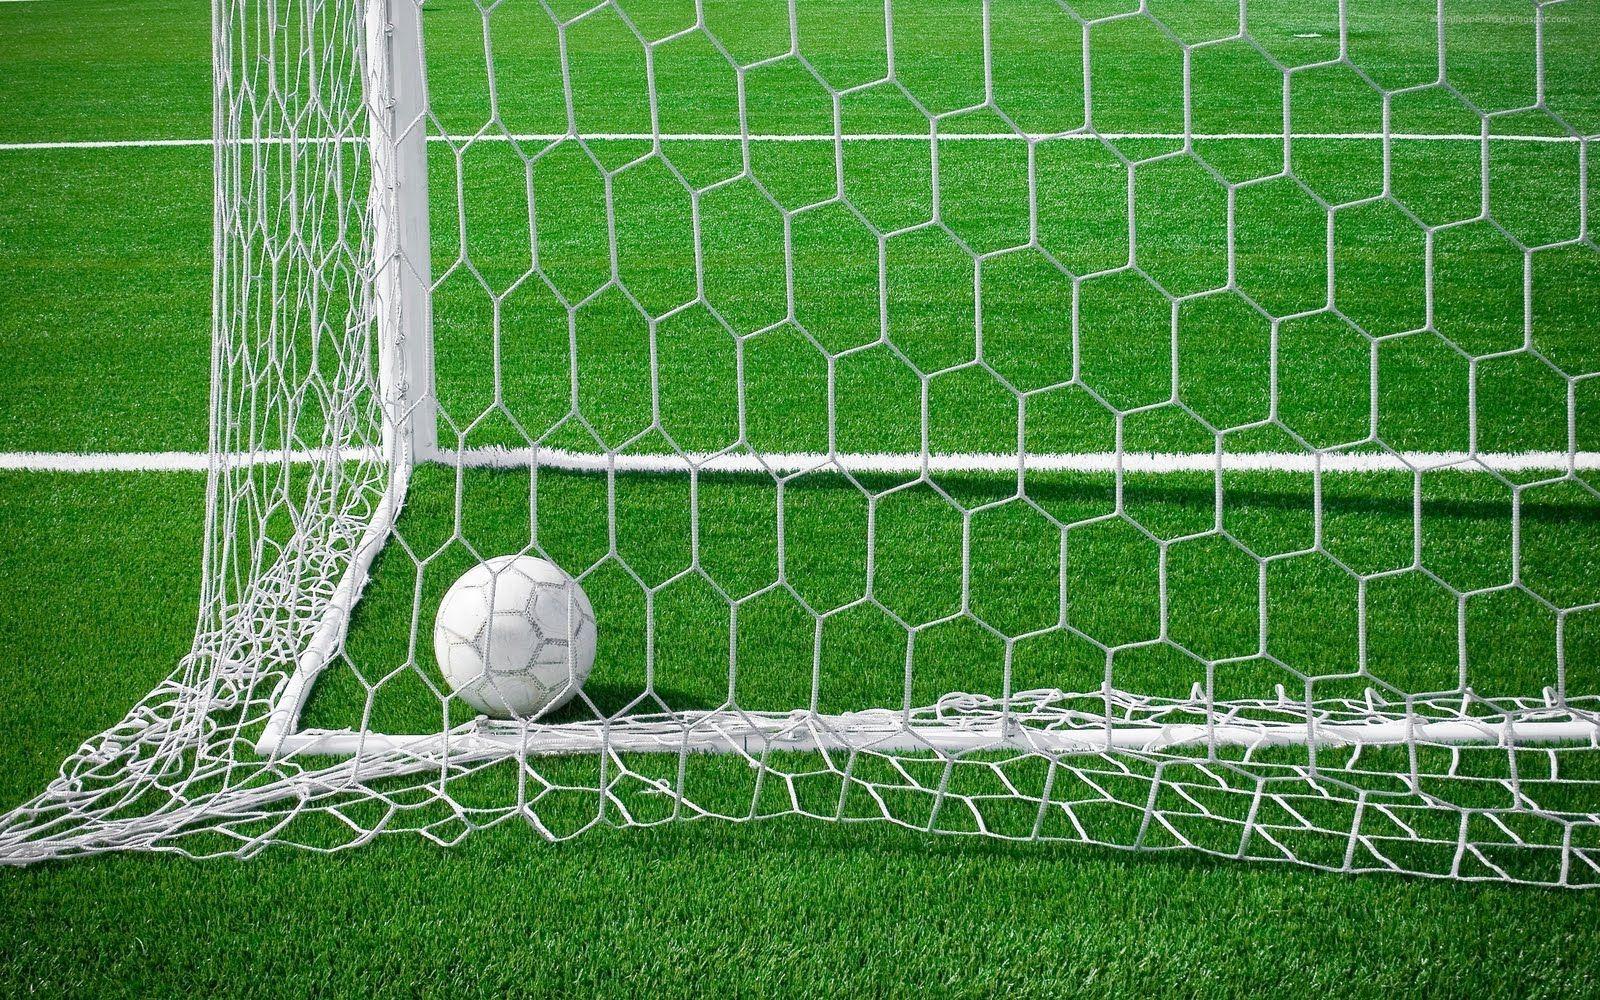 Soccer Ball Goal Hd Wallpaper Android Arco De La Cancha De Futbol Balon Football Pitch Soccer Field Soccer